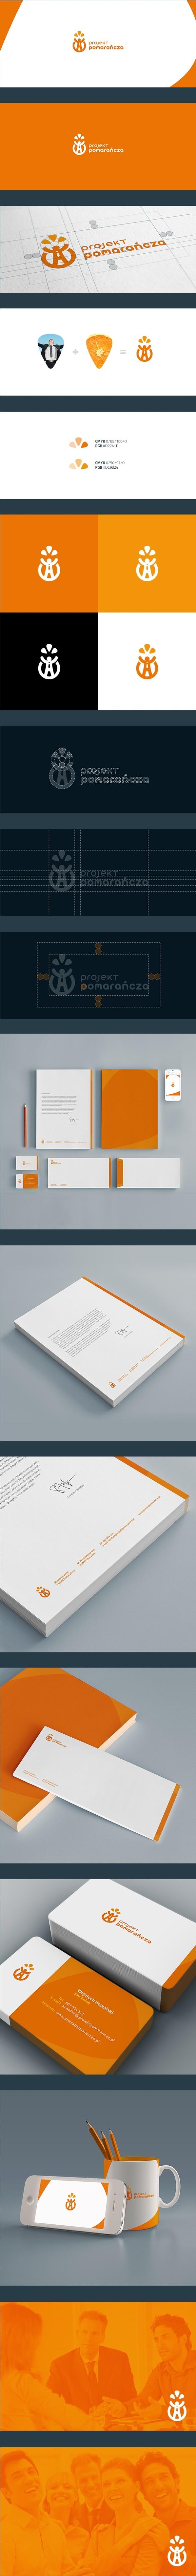 projekt-pomarancza